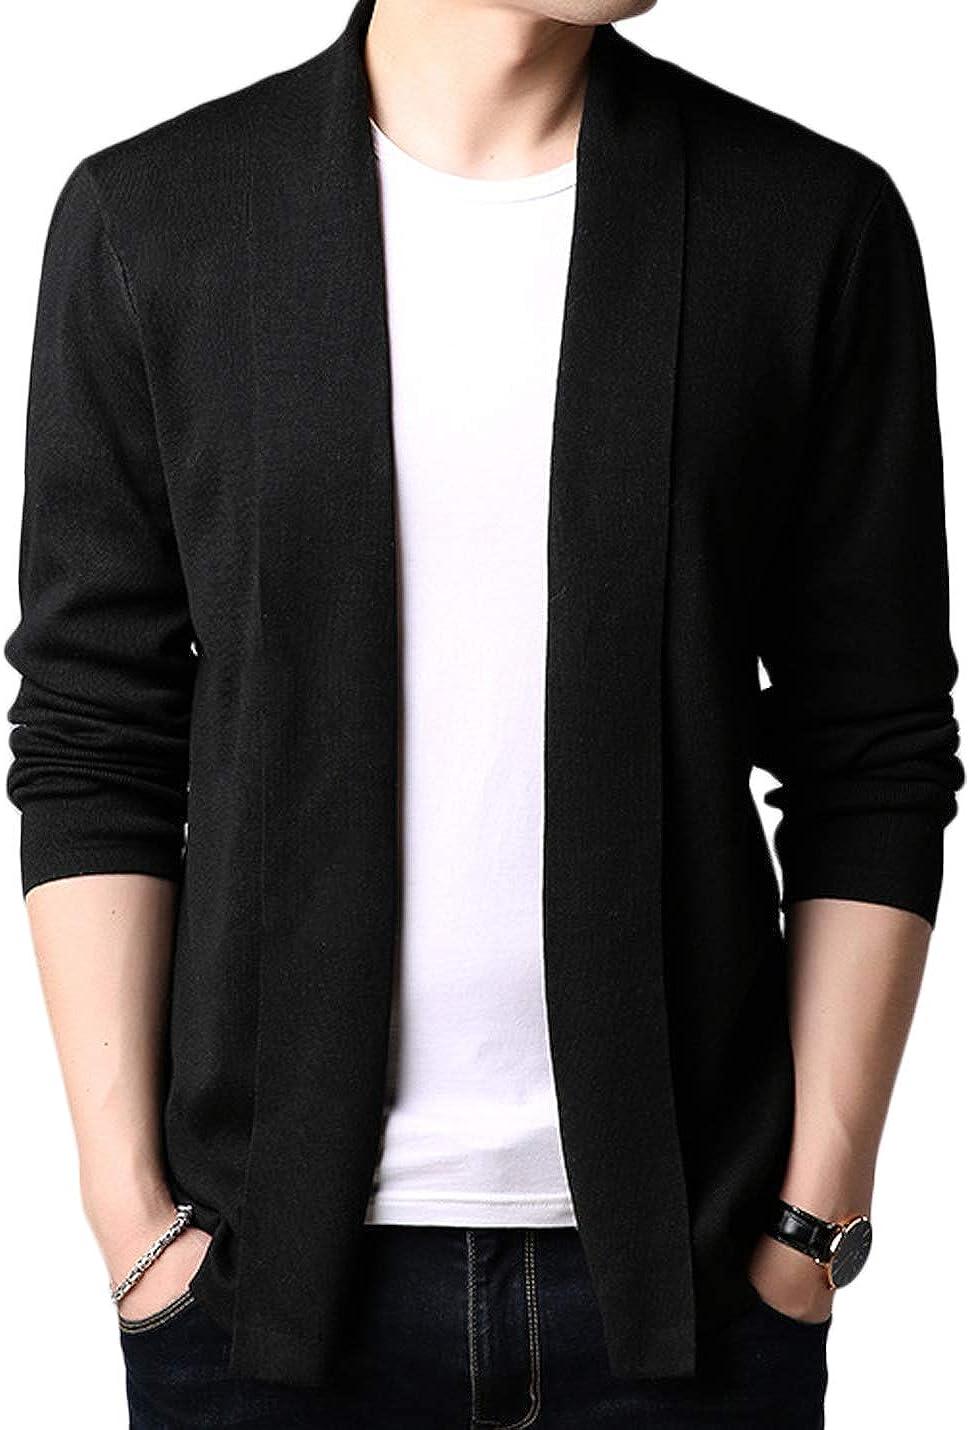 Jenkoon Men's Shawl Collar Cardigan Sweater Lightweight Knit Cardigan